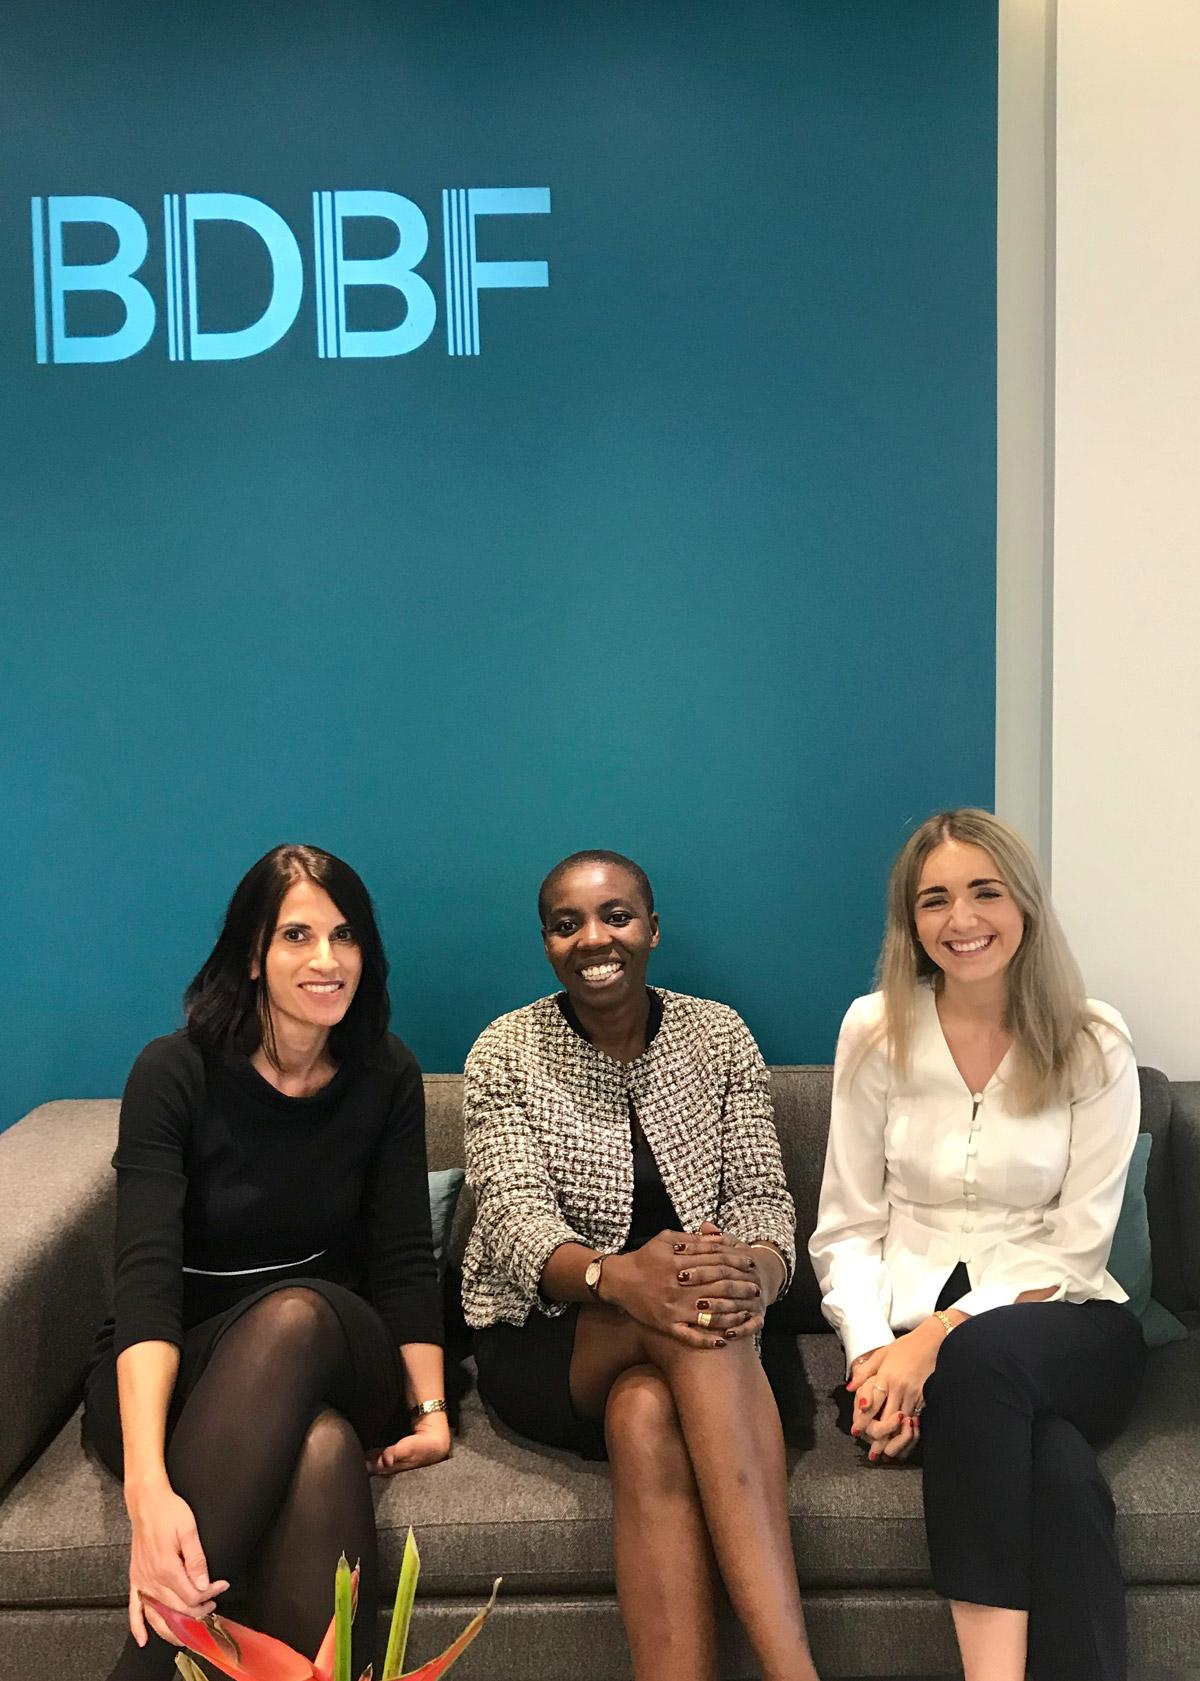 Amanda Steadman top notch growth for bdbf - bdbf llp